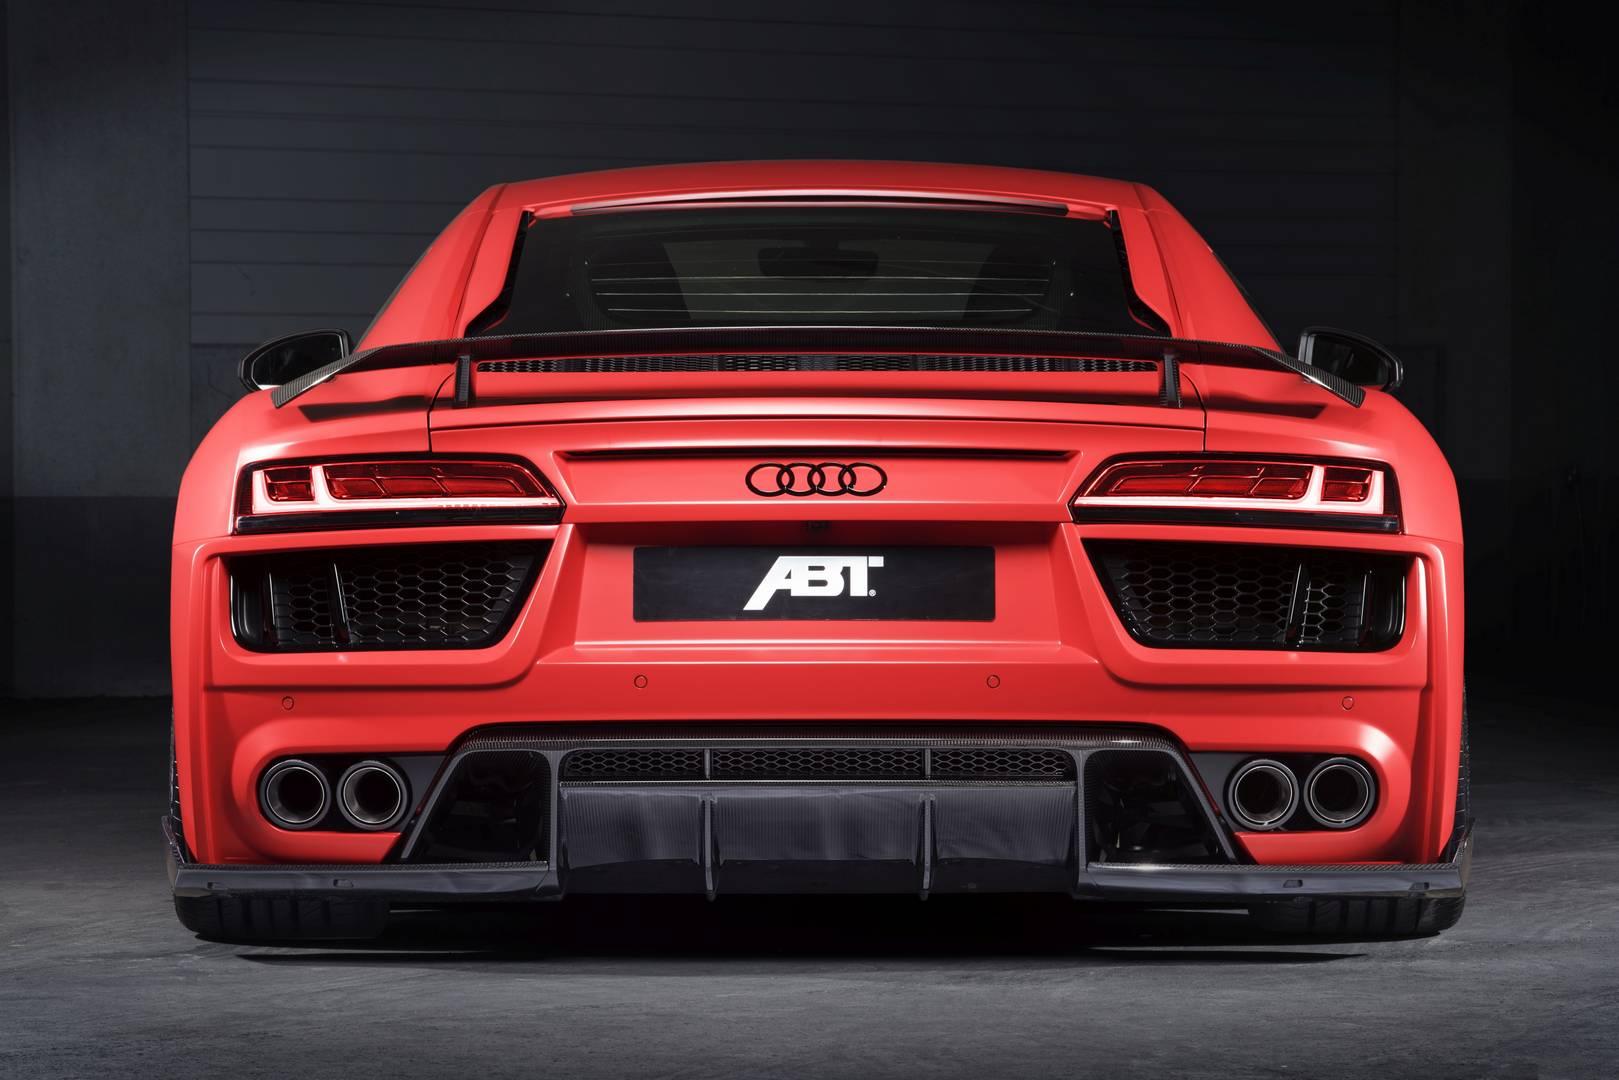 Official 2017 Abt Audi R8 V10 Gtspirit